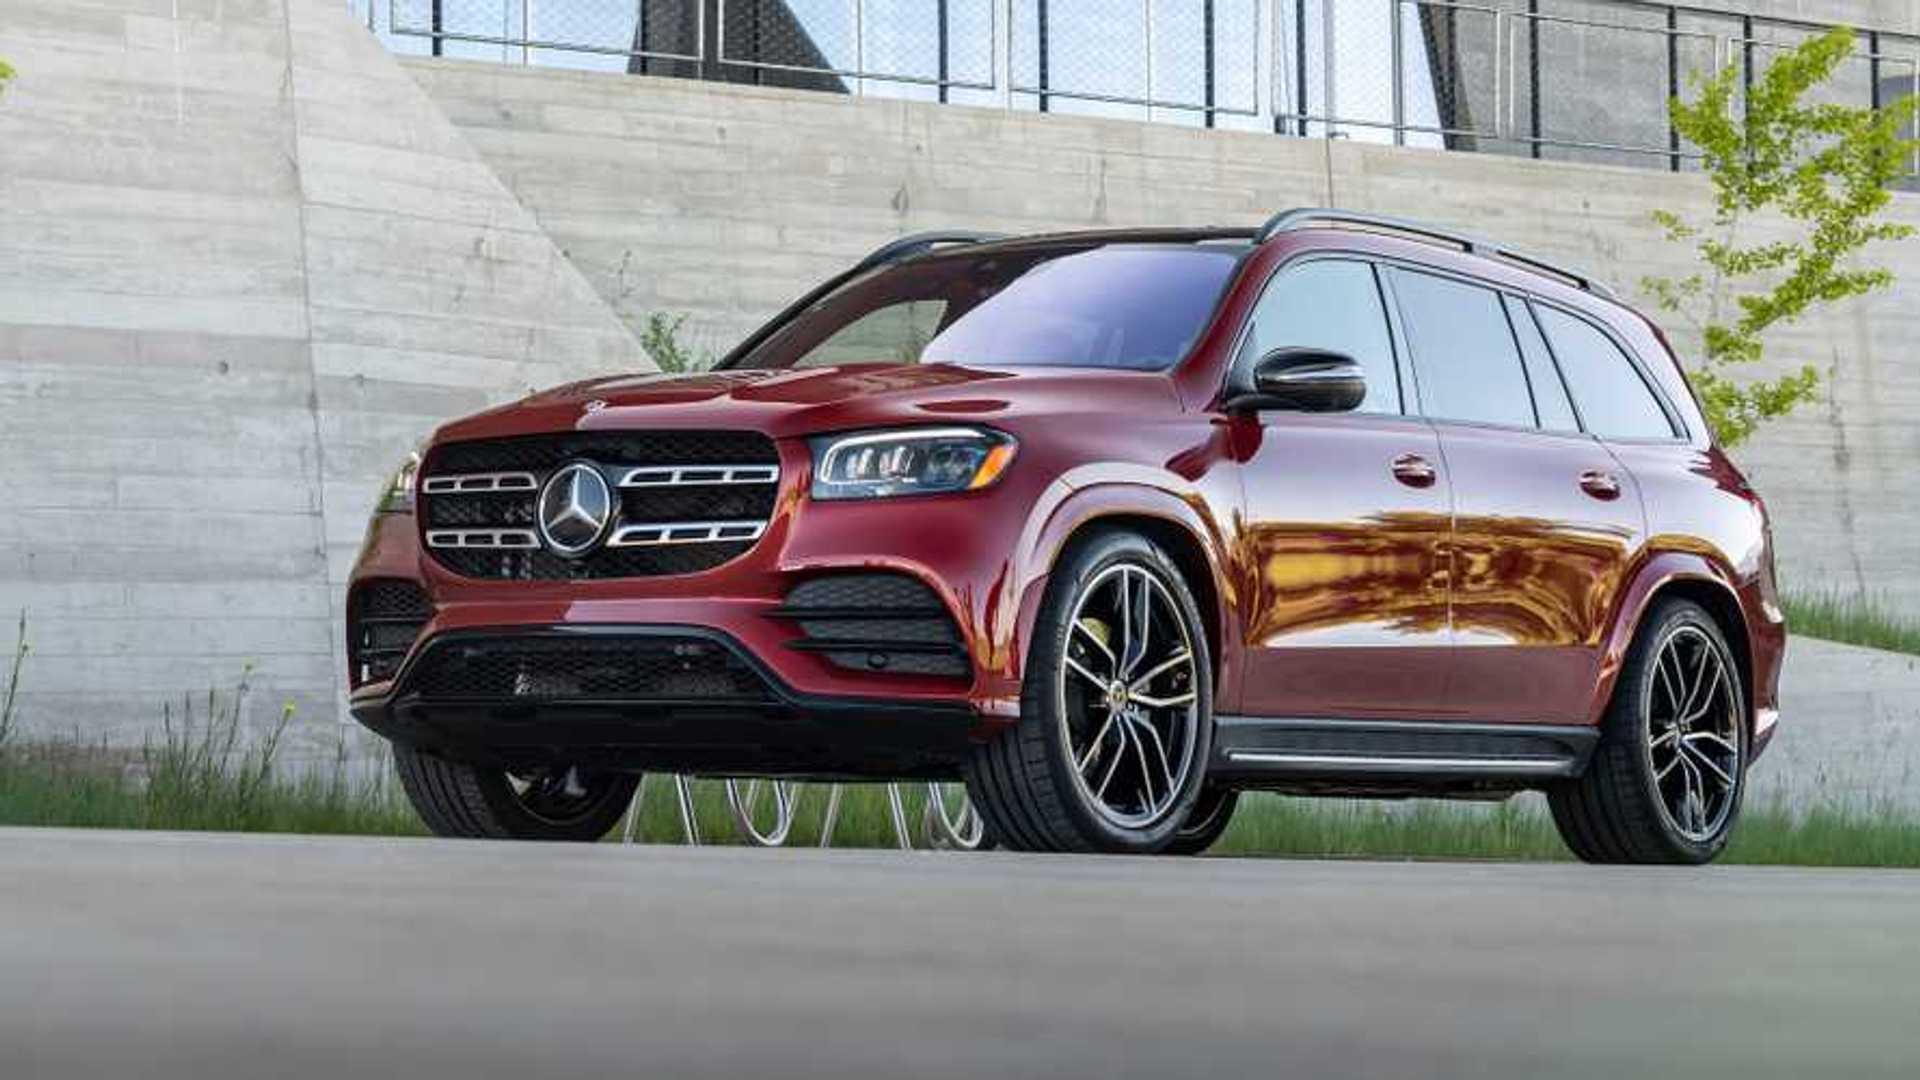 2020 Mercedes – Benz GLS New Engine, Price Updates >> 2020 Mercedes Benz Gls First Drive Best A Benz Can Get